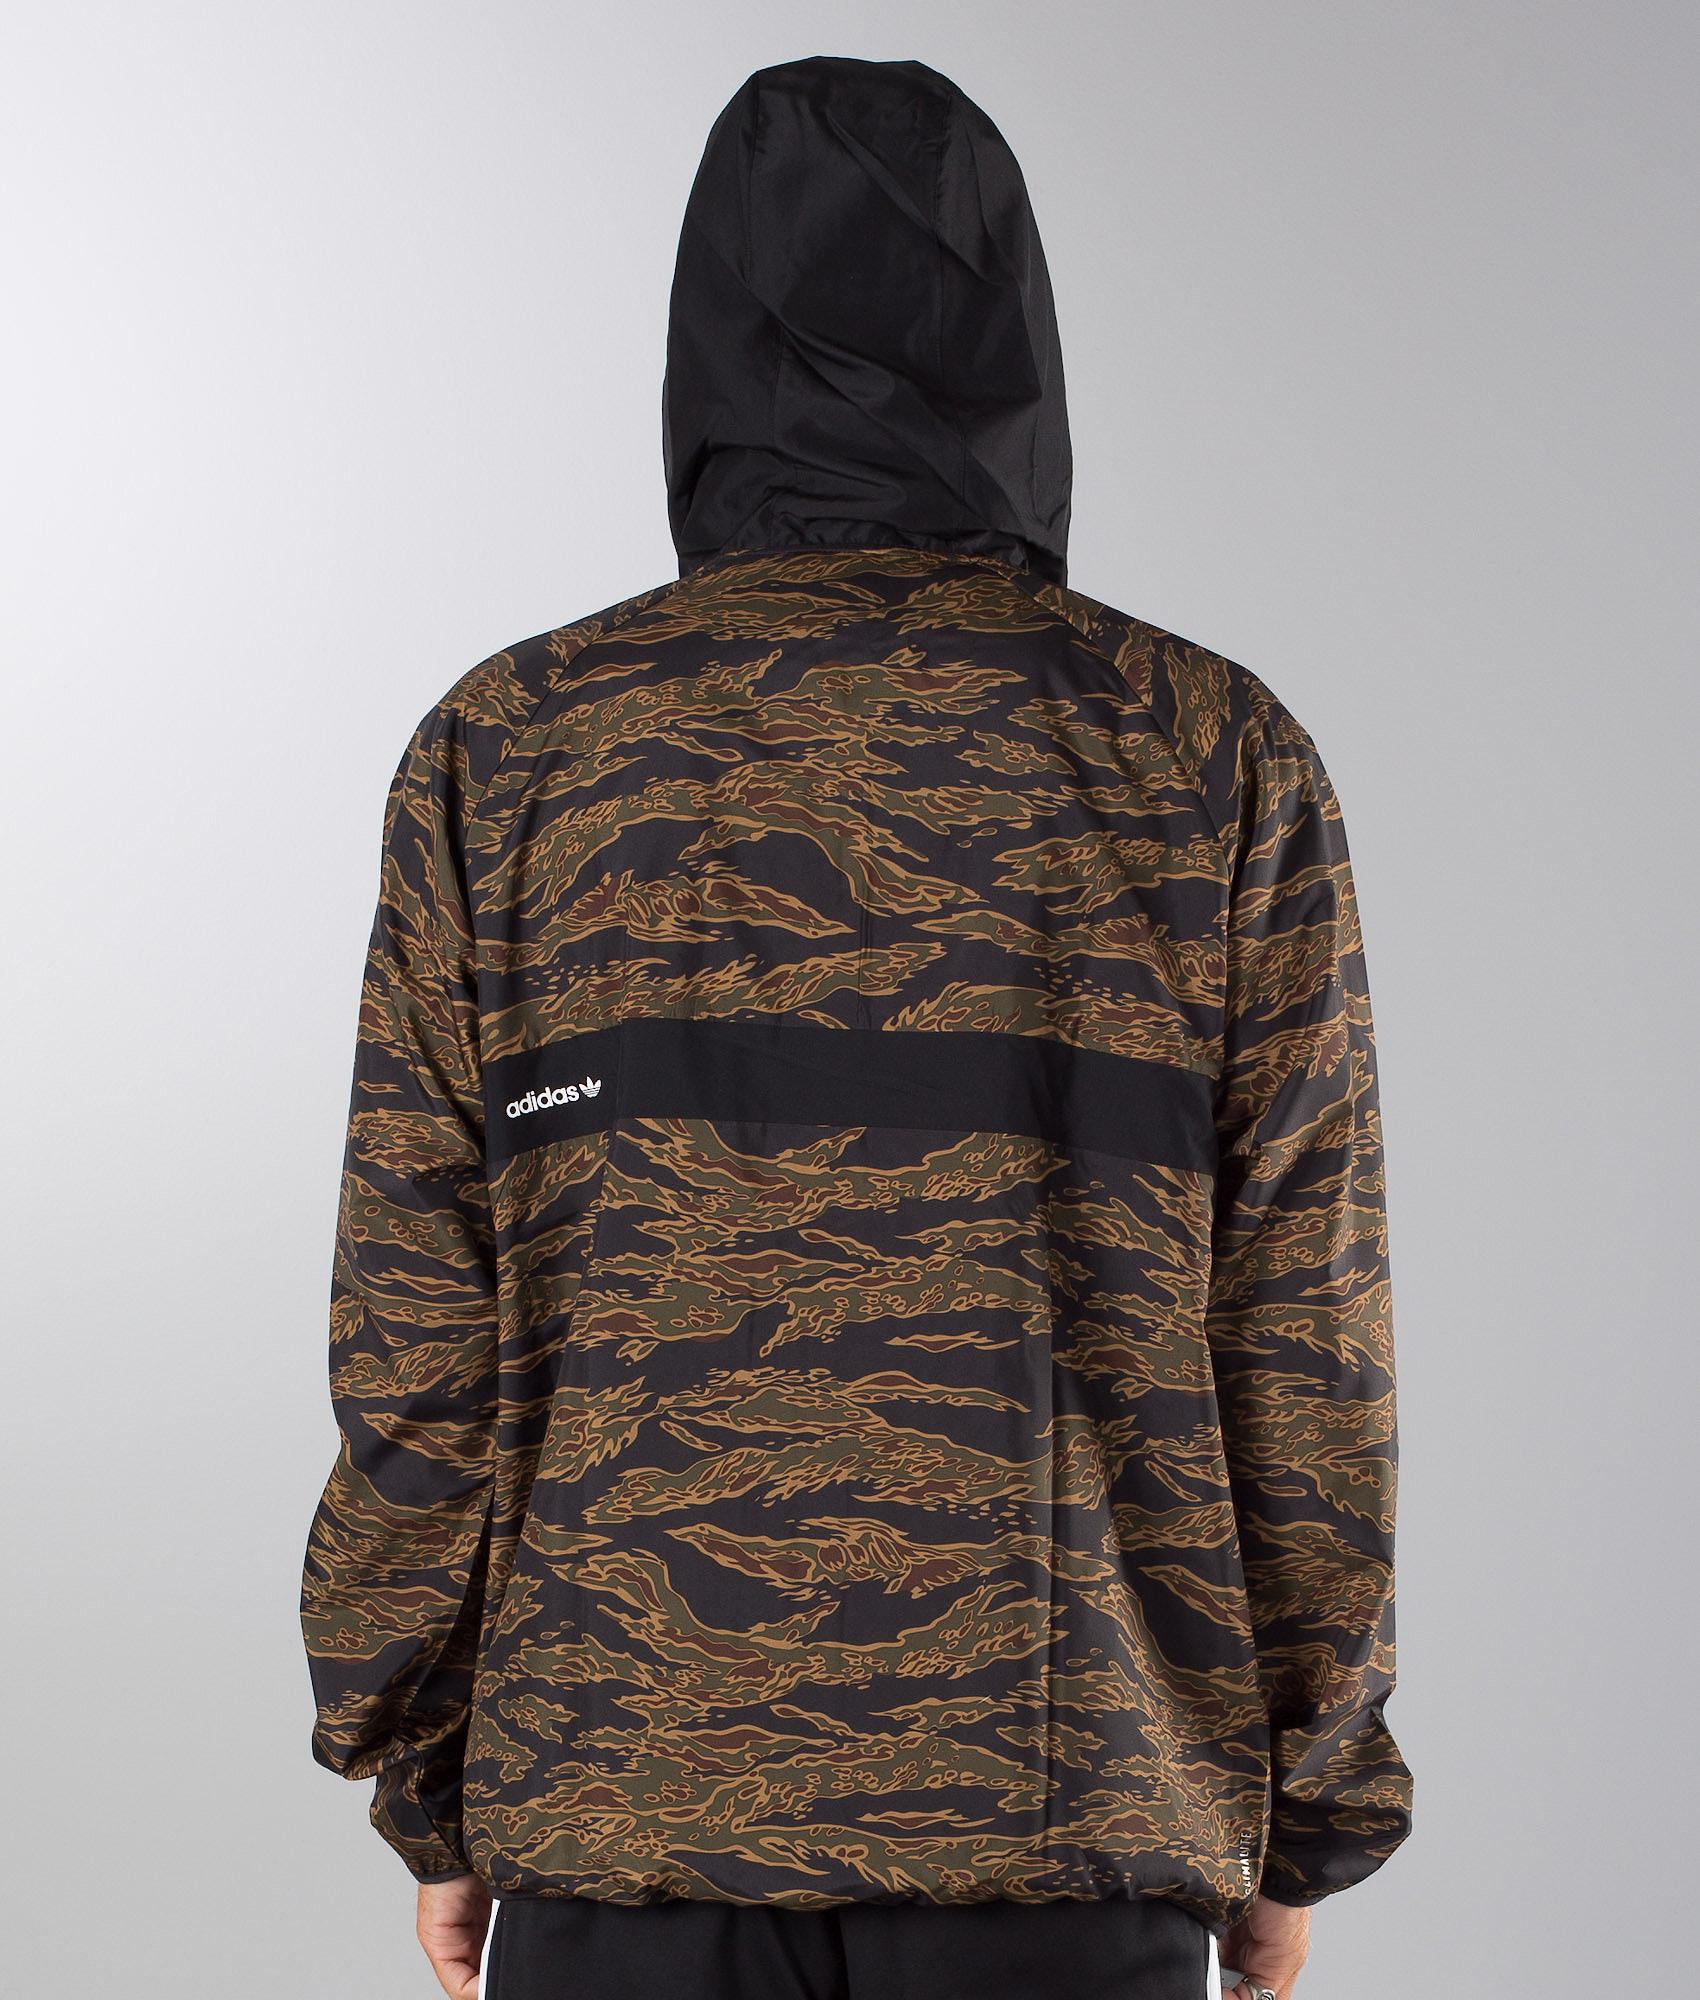 831c552c3 Adidas Skateboarding Camo Blackbird Packable Jacket Camo Print/Black ...